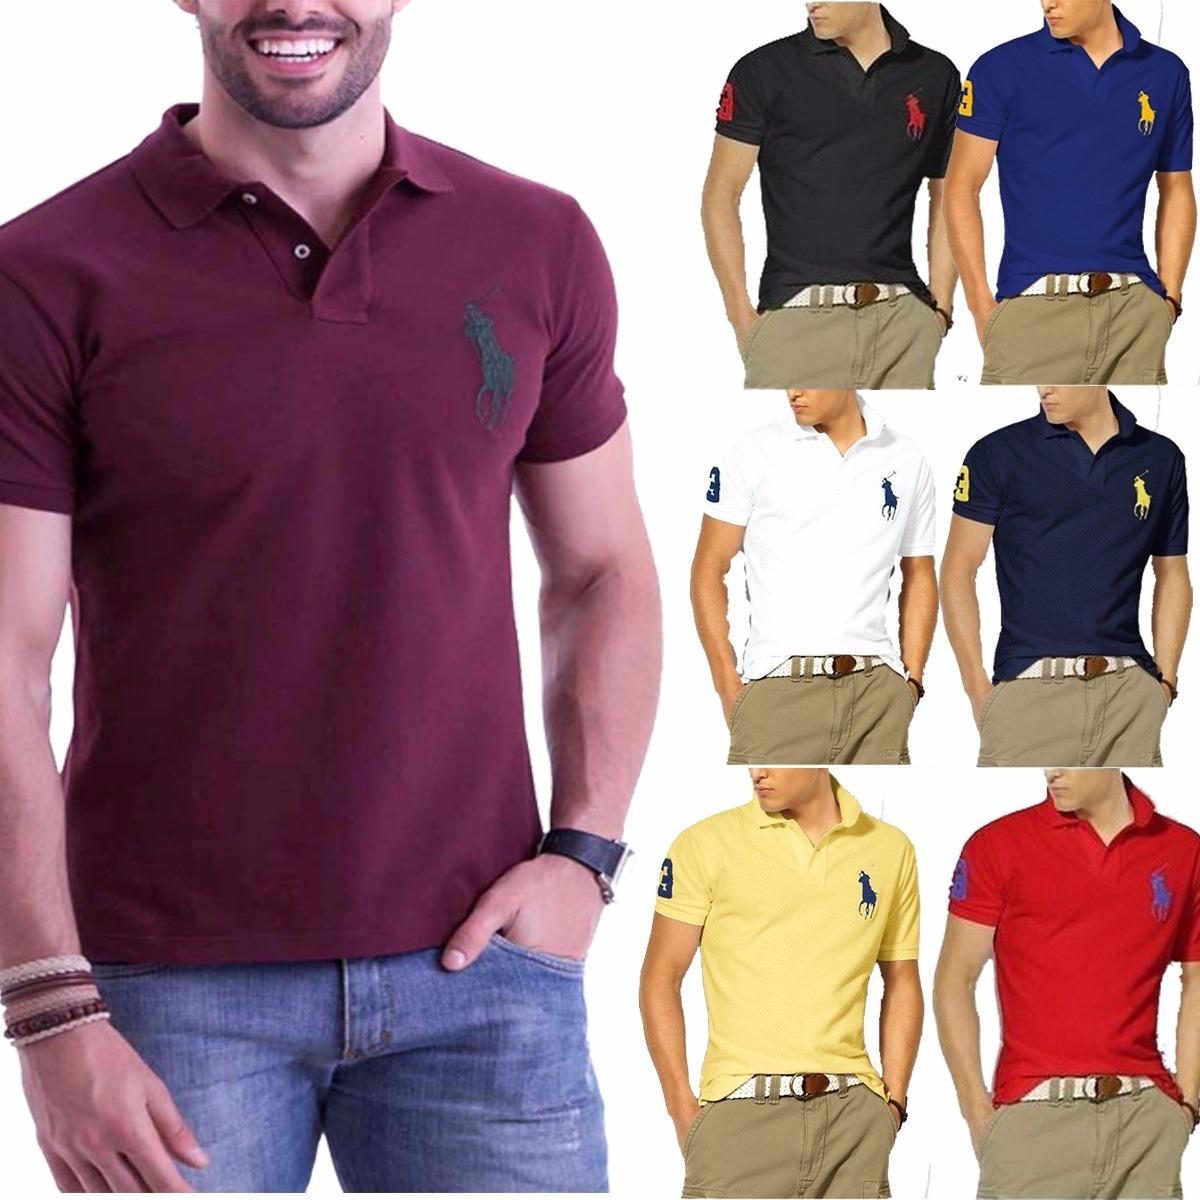 2816c50b8 Kit 05 Camisas Camisetas Revenda Gola Polo Masculina Atacado - R  89 ...